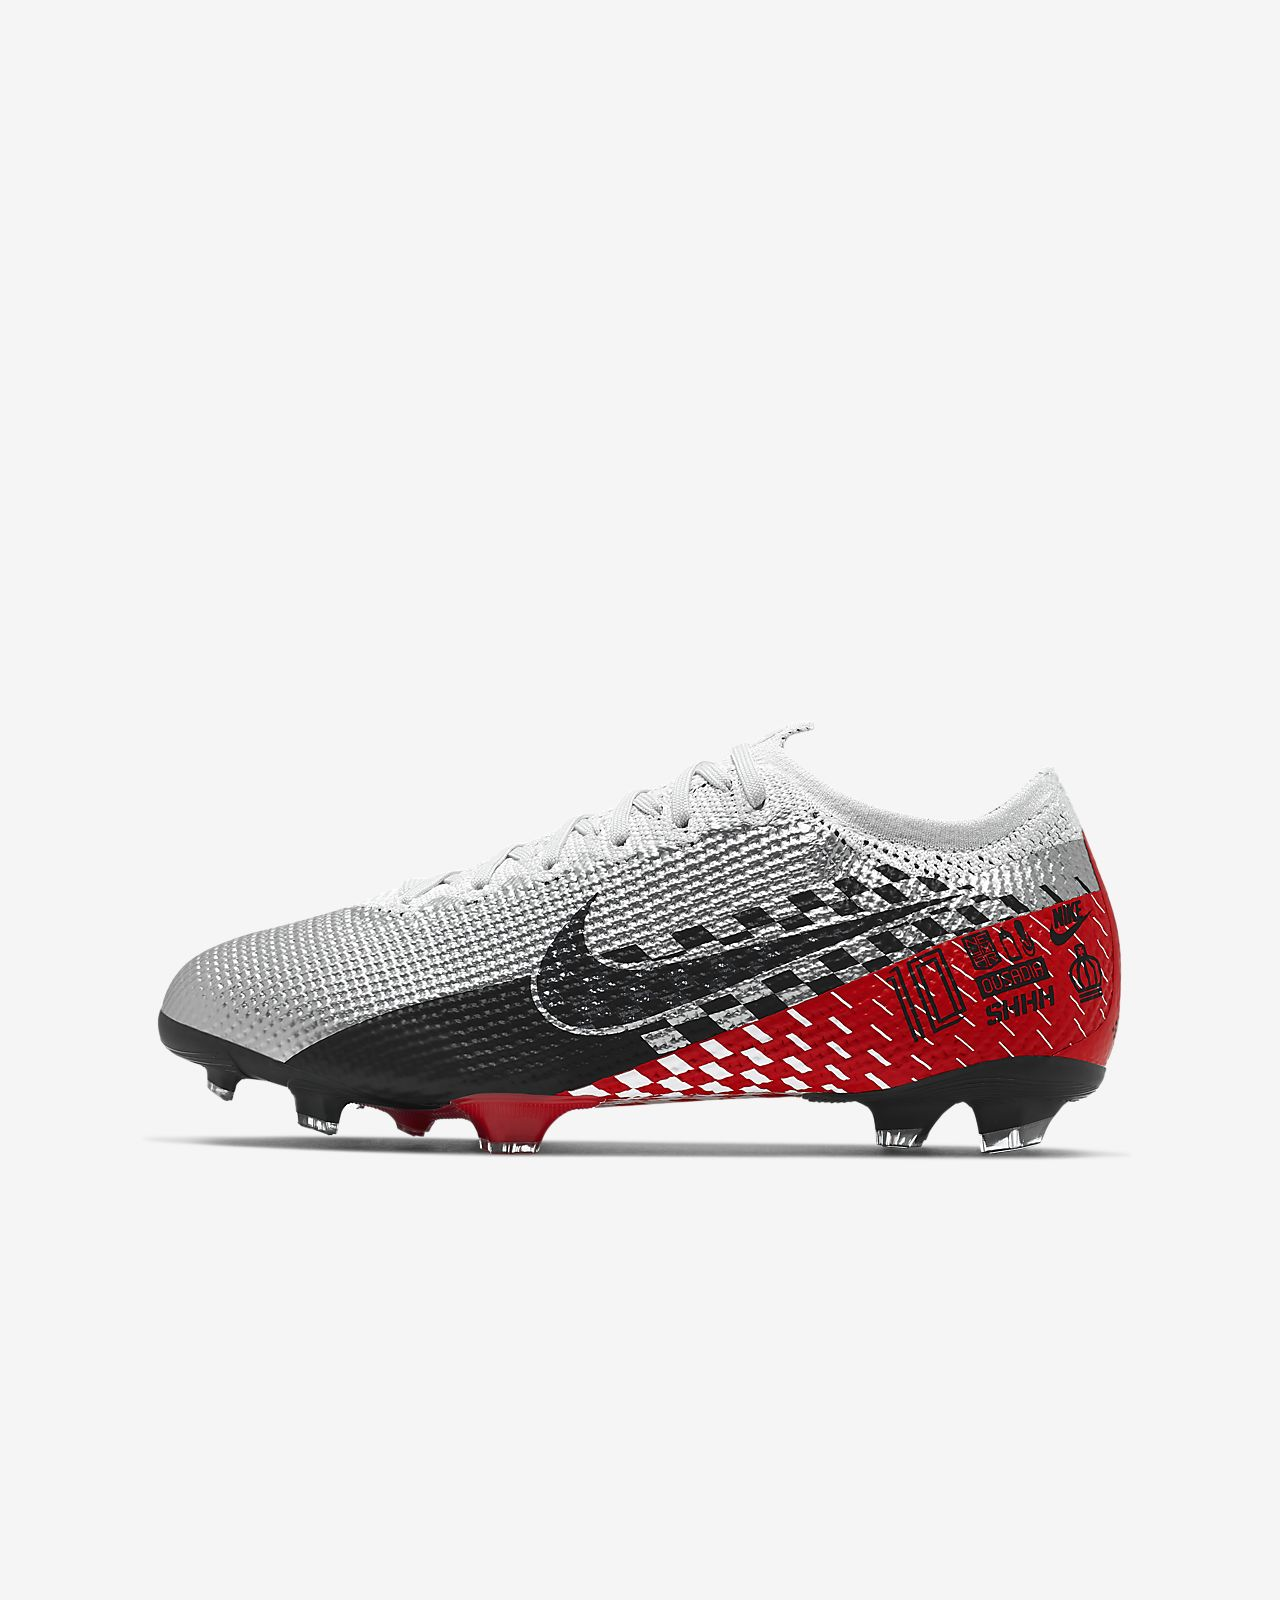 Nike Jr. Mercurial Vapor 13 Elite Neymar Jr. FG Botas de fútbol para terreno firme - Niño/a